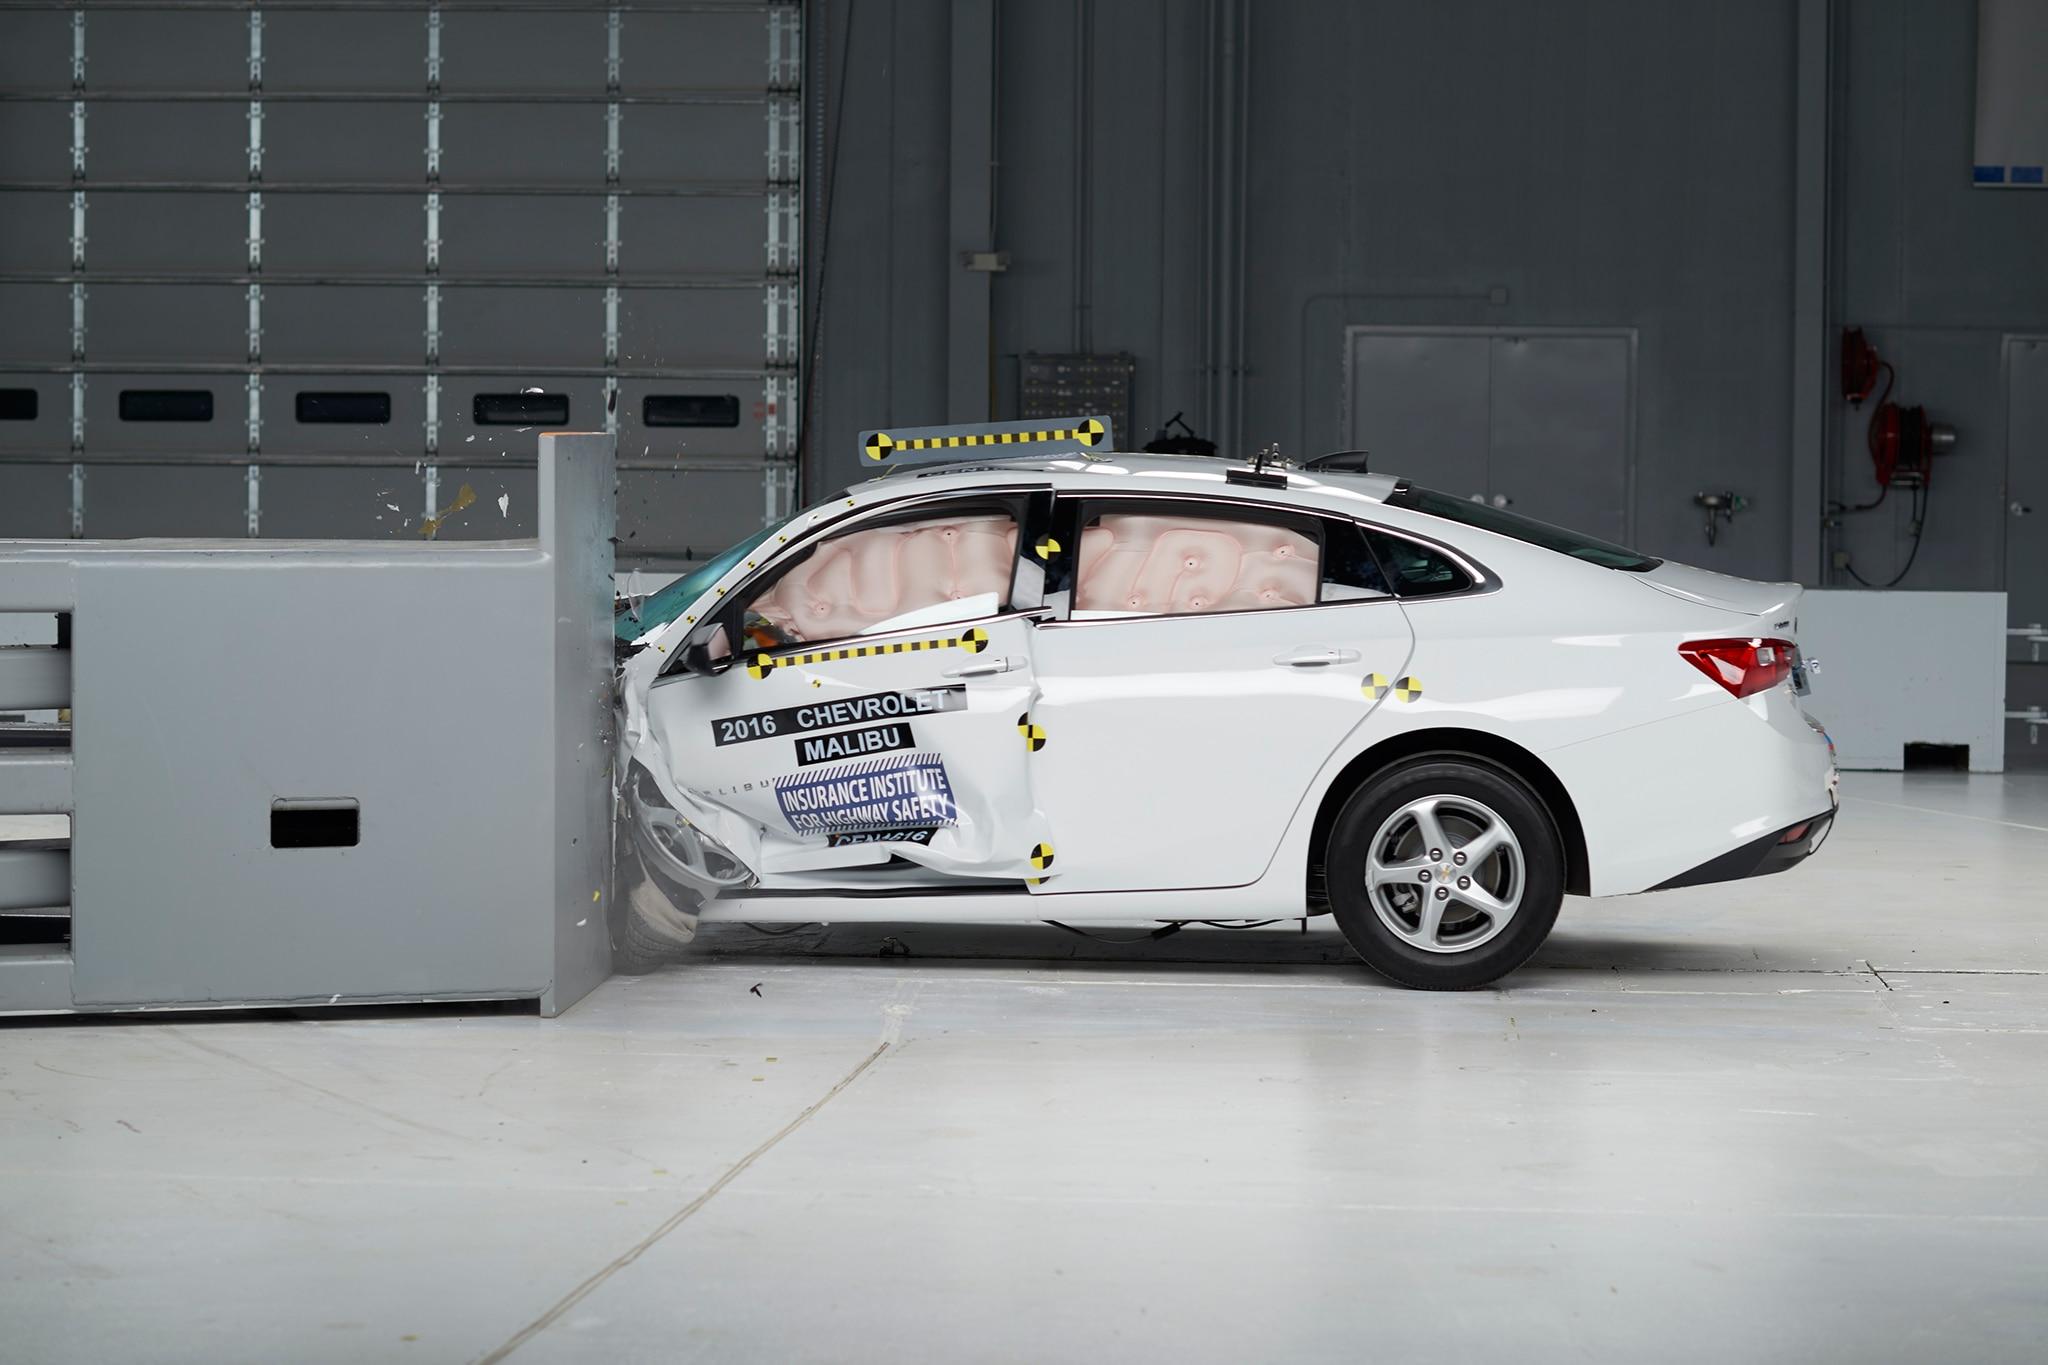 2016 Chevrolet Malibu IIHS Testing Side Profile Crash